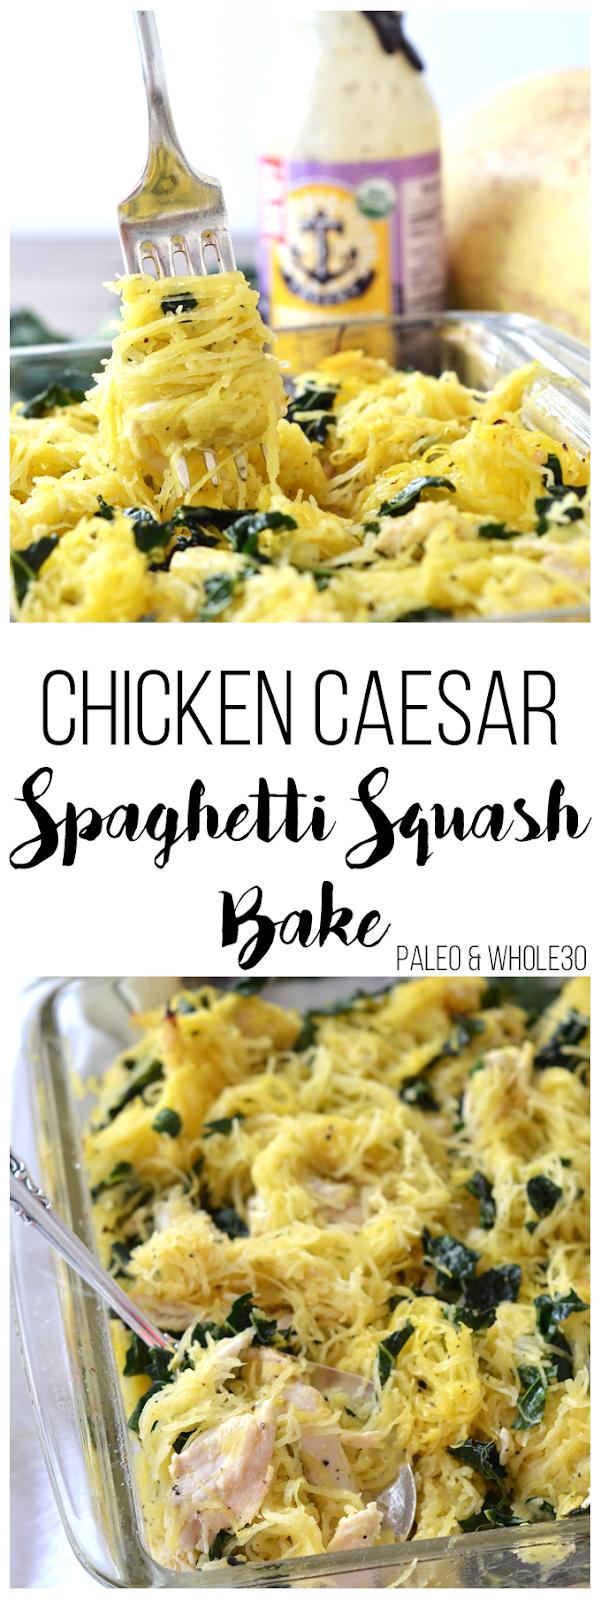 Chicken Caesar Spaghetti Squash Bake